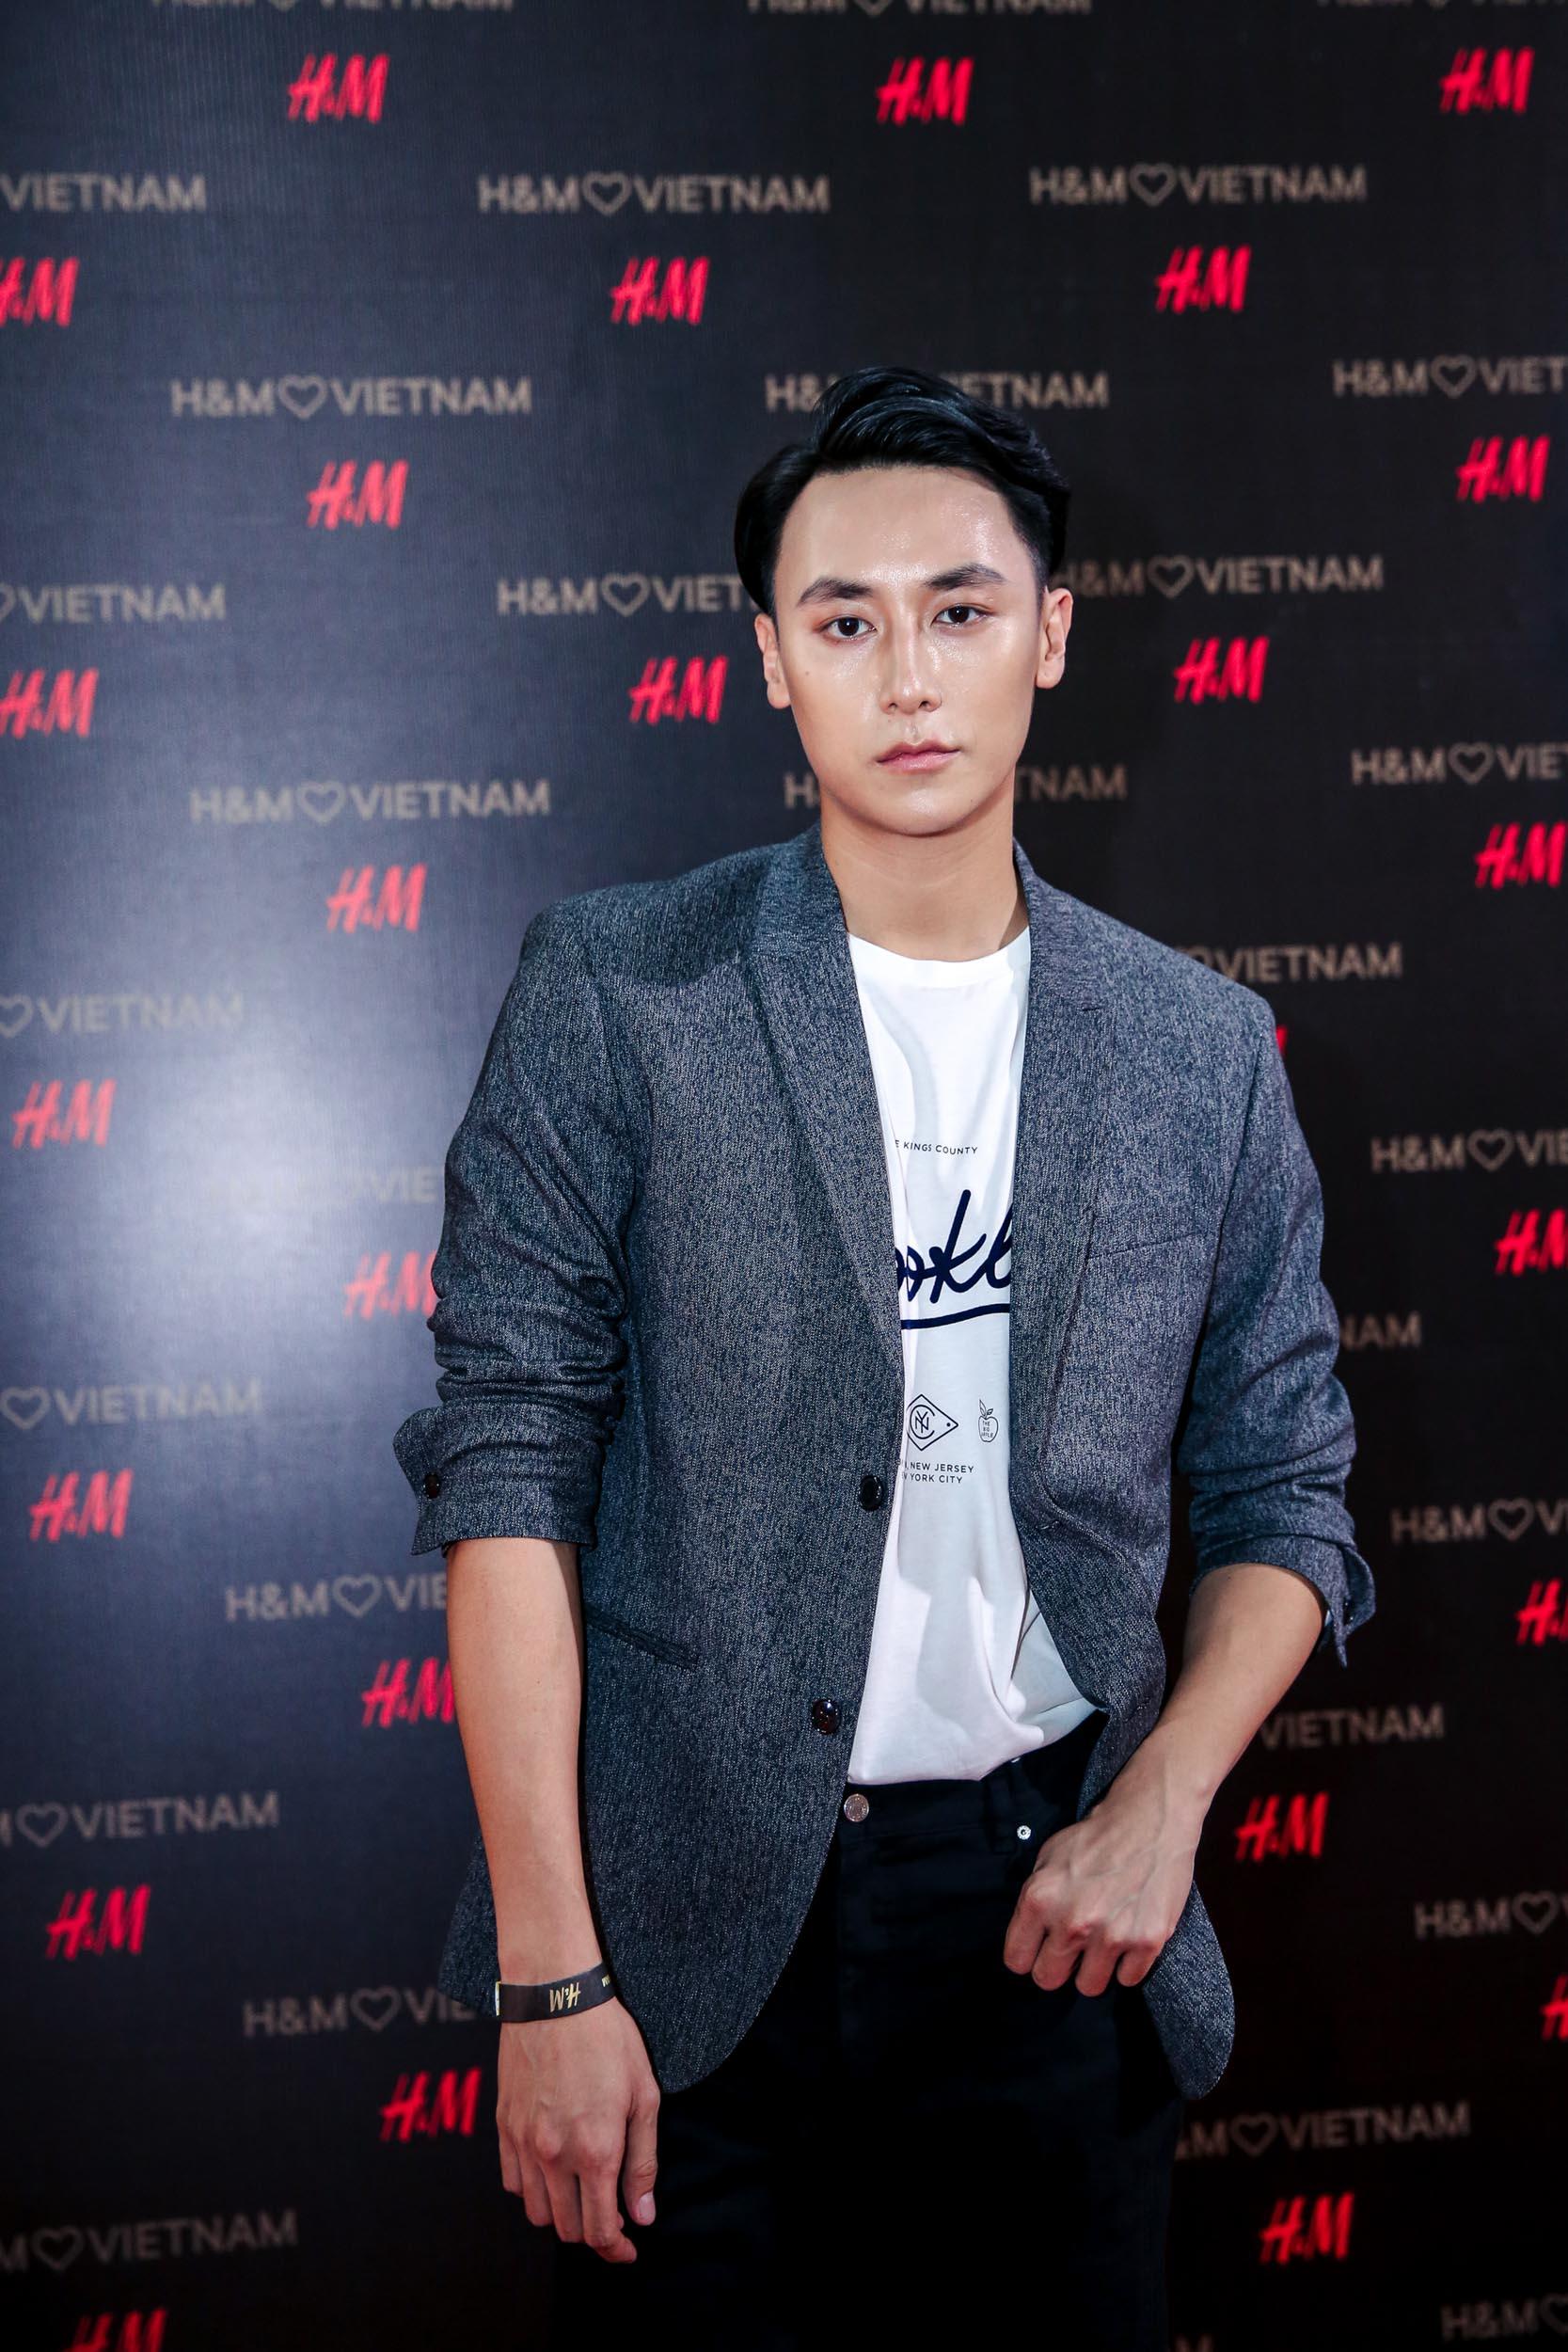 Ca sĩ Rocker Nguyễn.